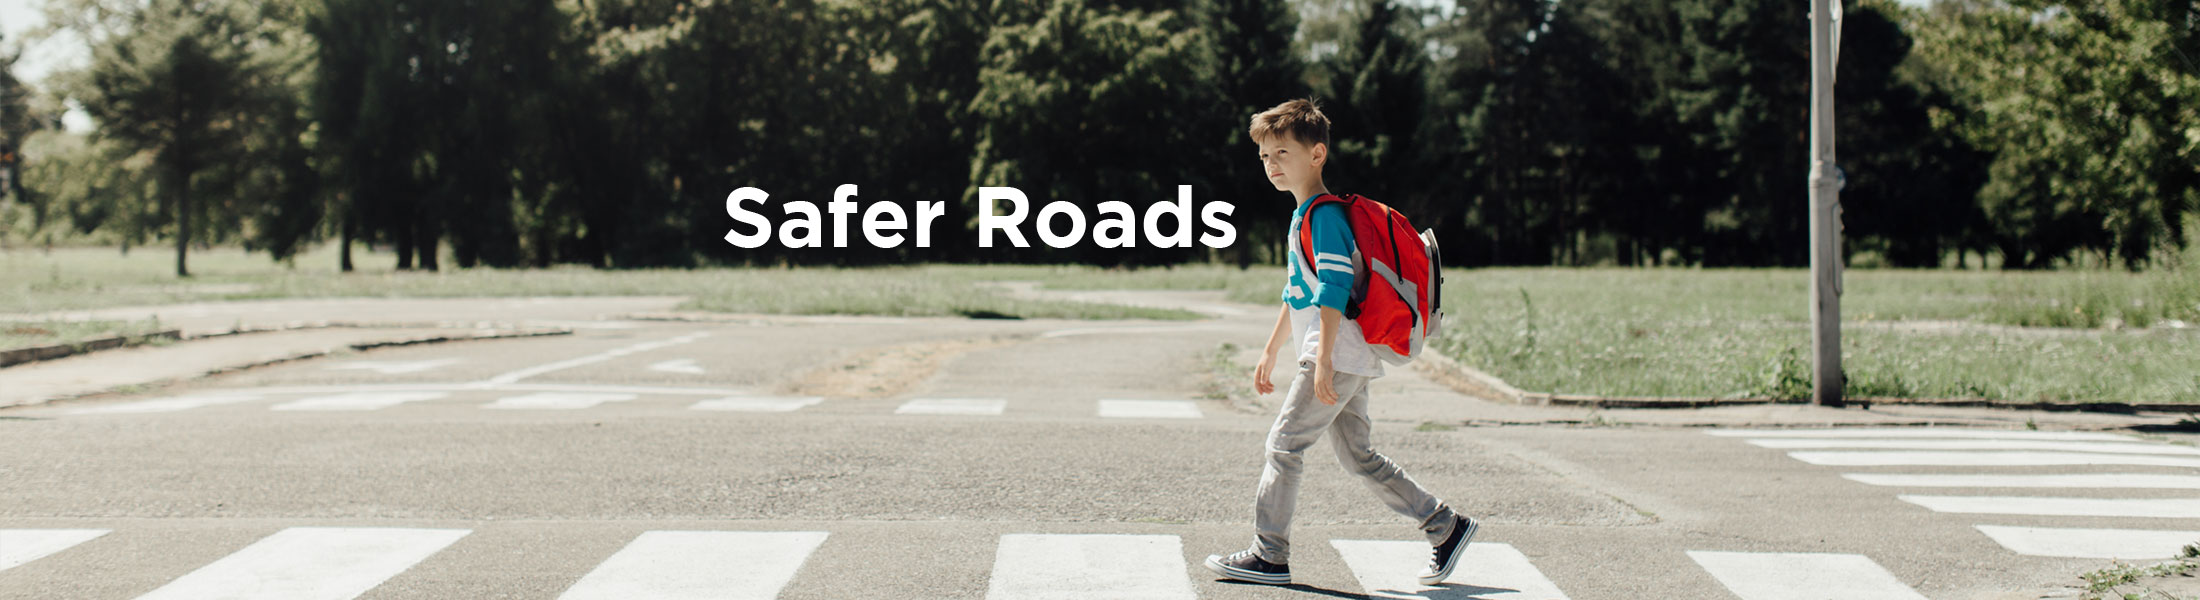 Safer Roads in Milton Ontario John Challinor Town of Milton Ward 2